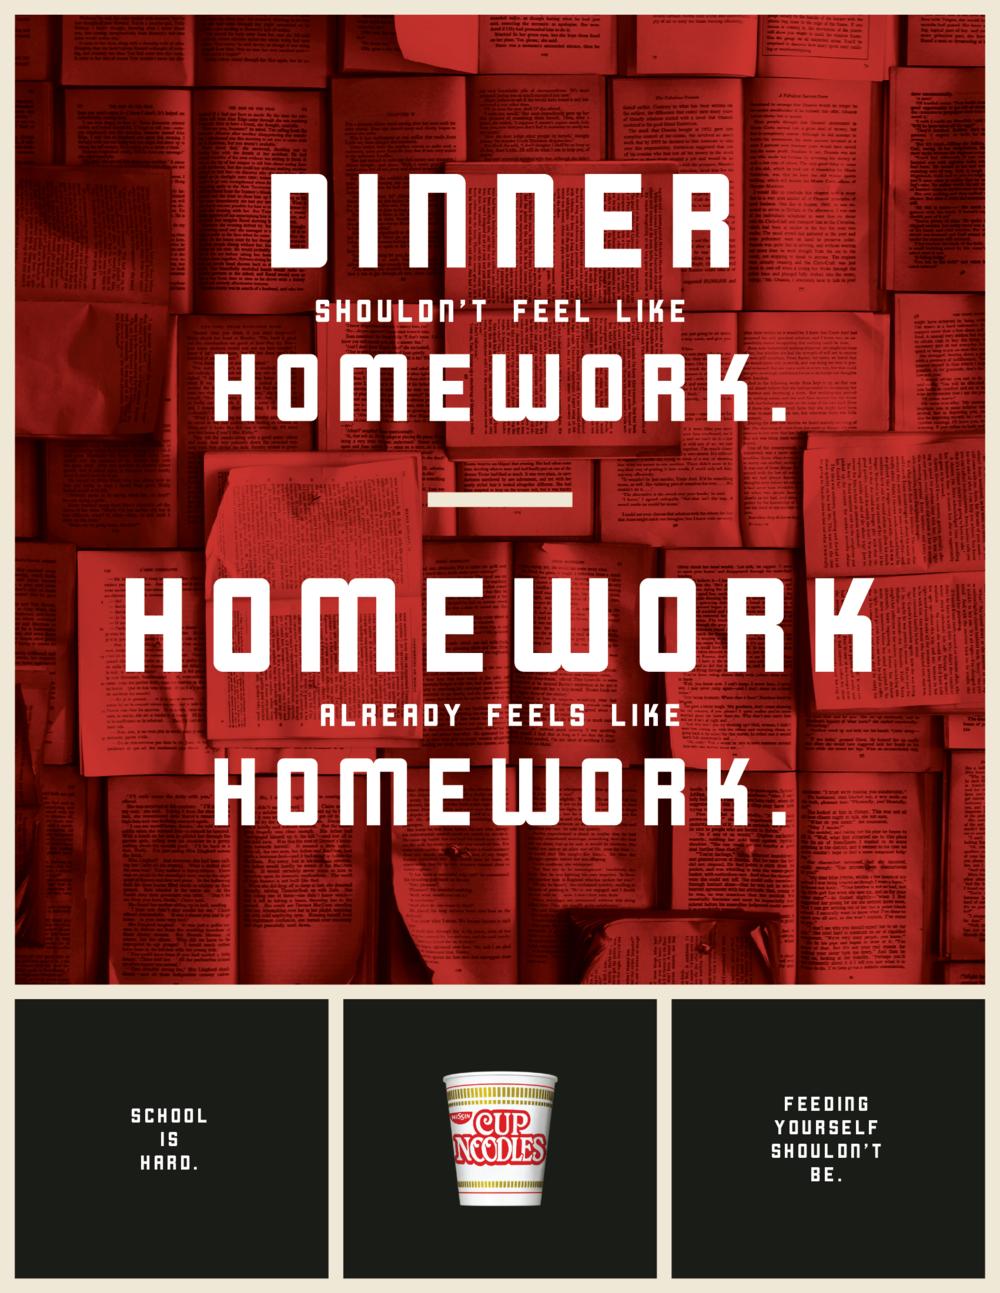 cup-noodles-homework.png